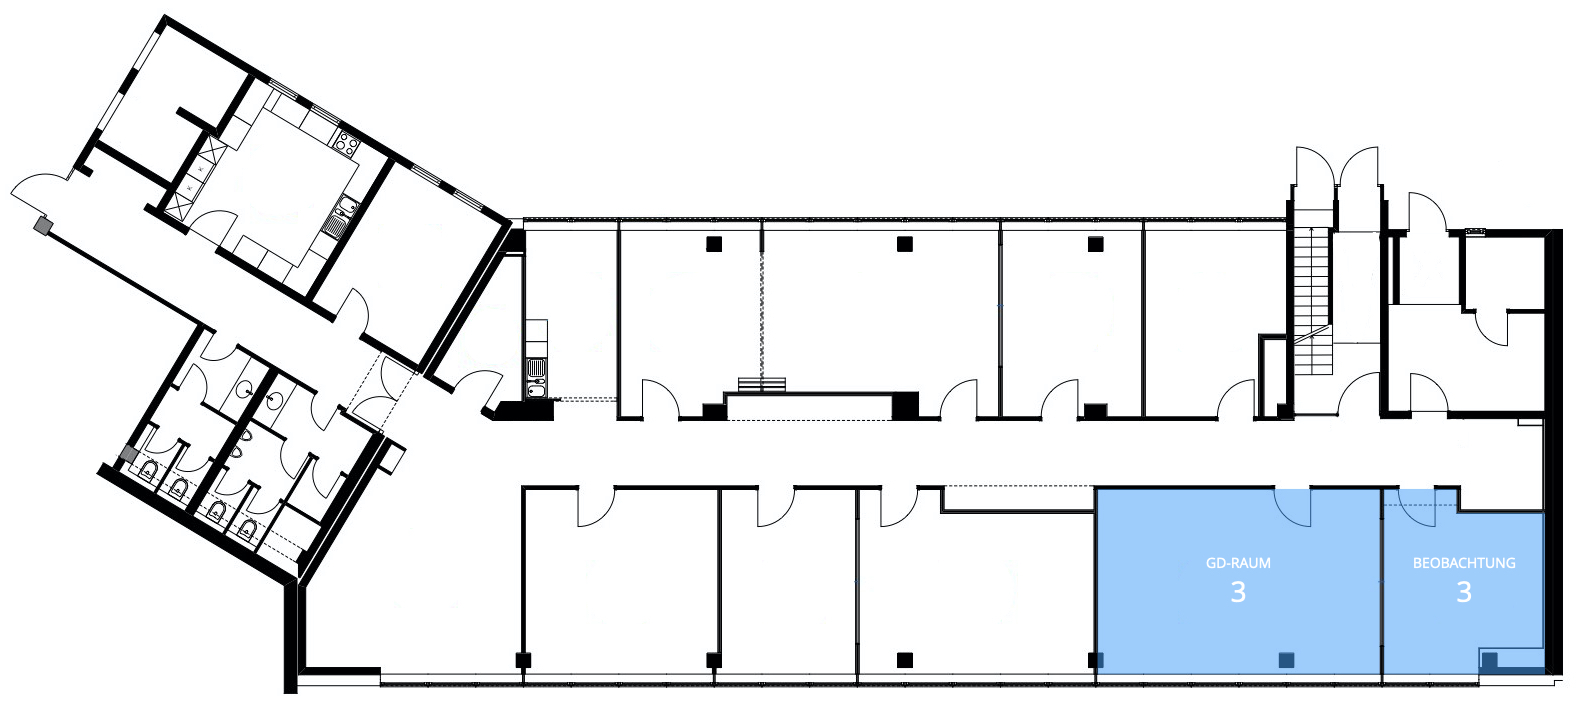 iTEMS Grundriss: GD-Raum 3